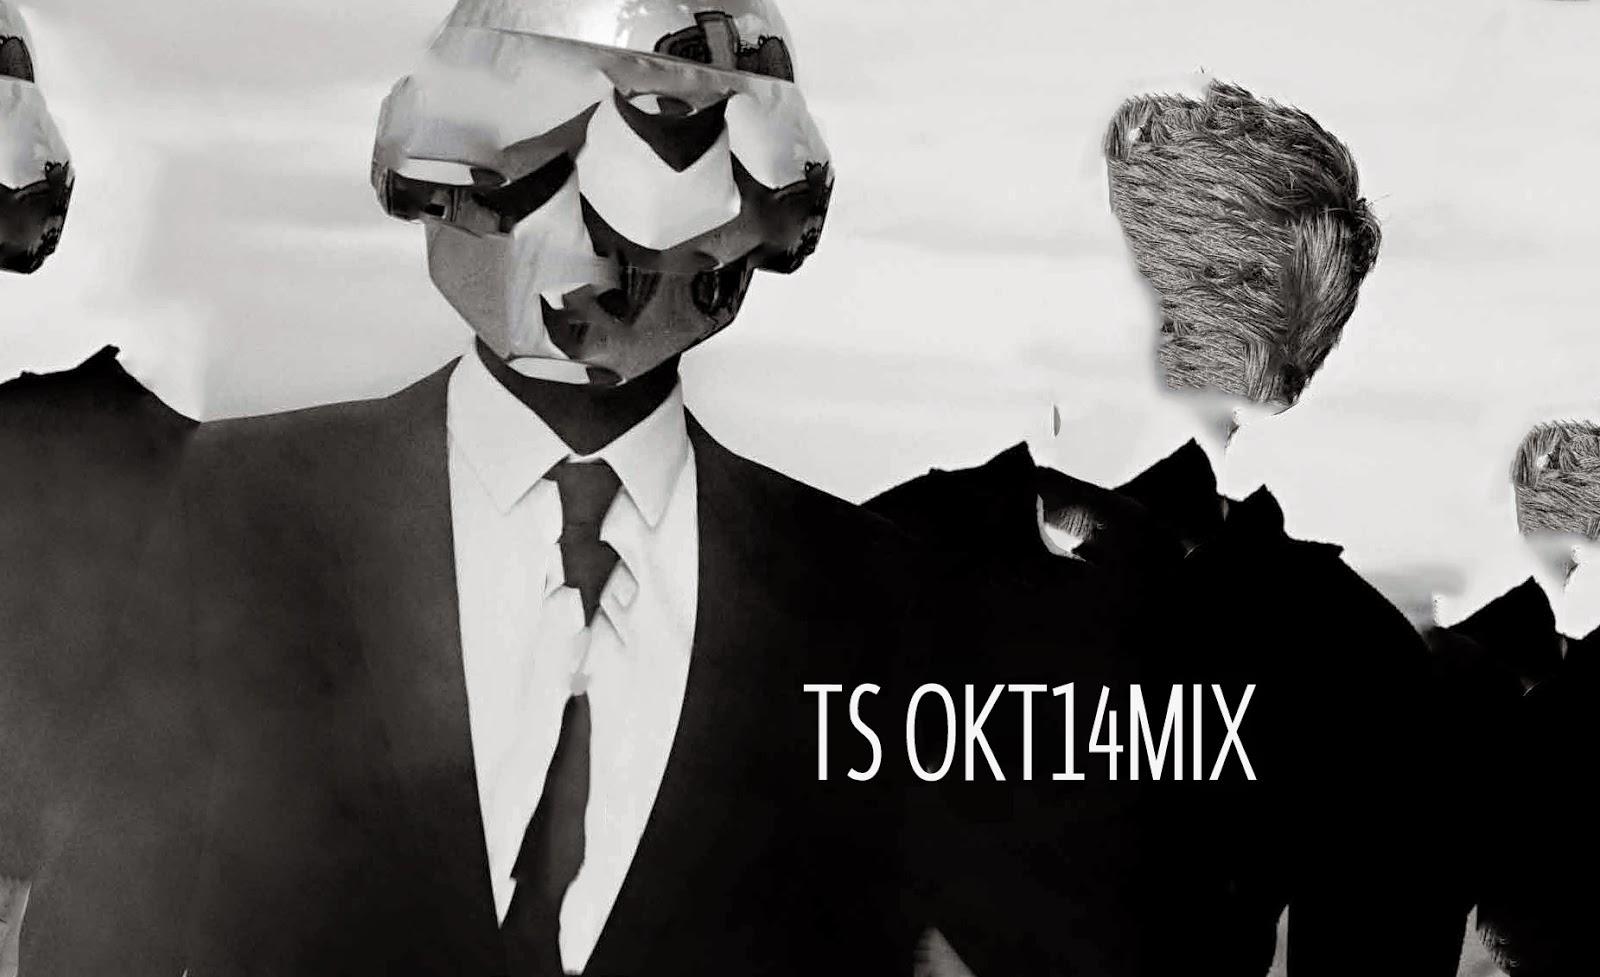 TS OKT14MIX